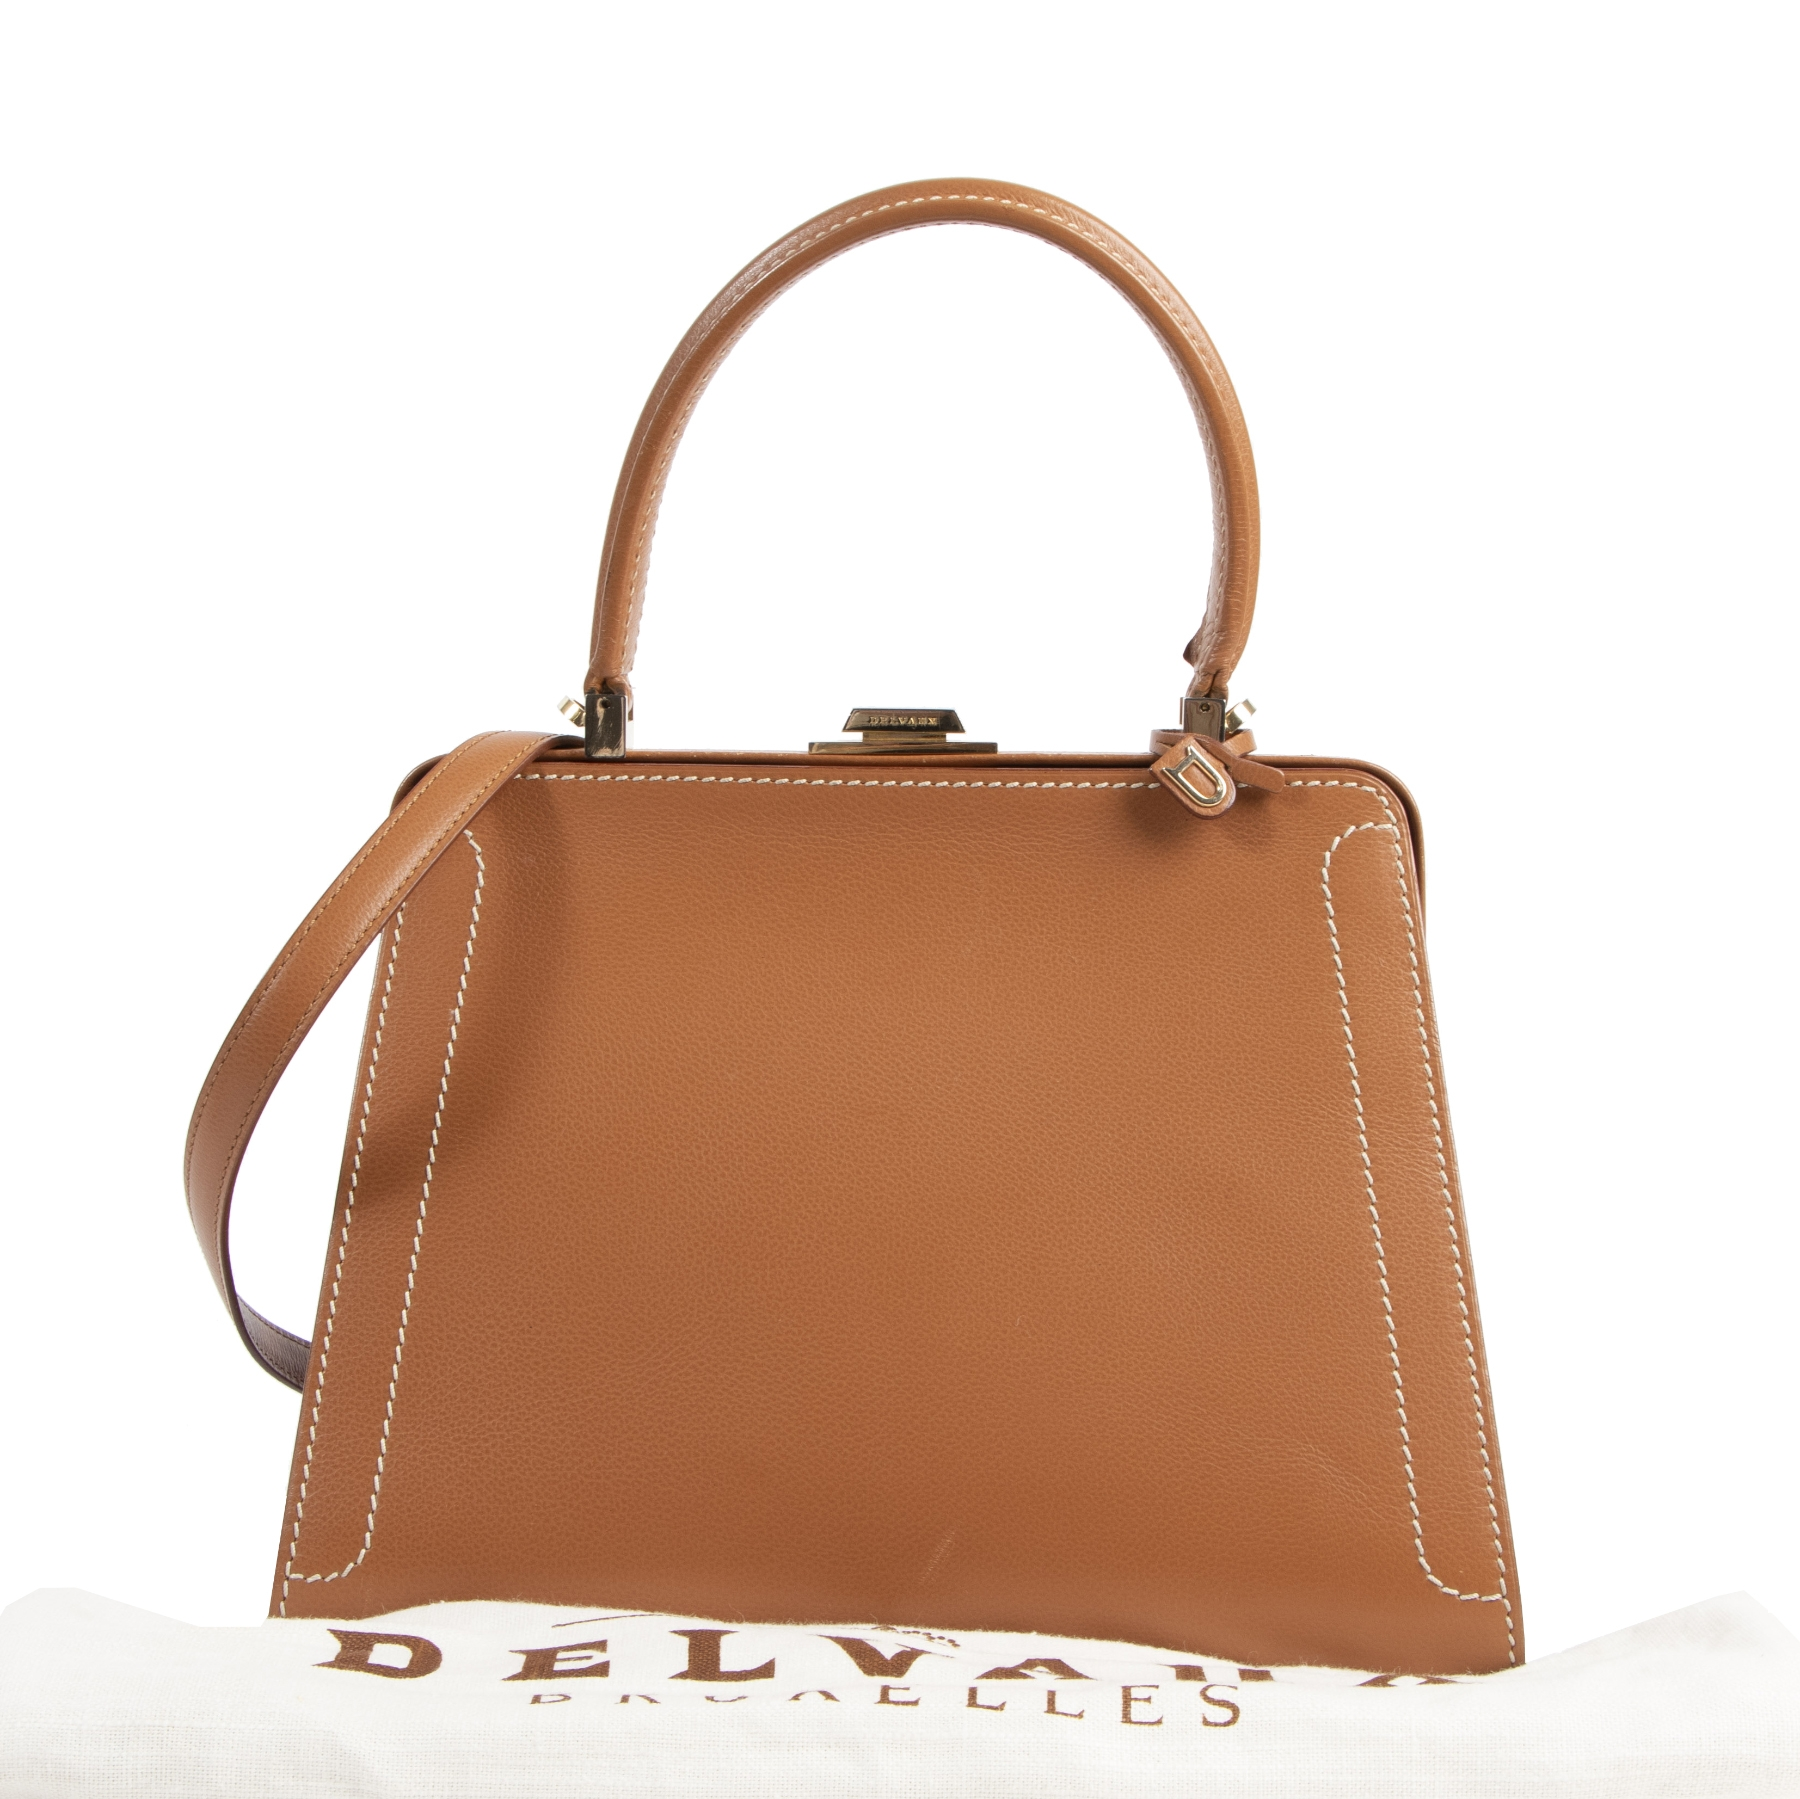 Authentic secondhand Delvaux Evasion Cognac Leather Top Handle designer bags fashion luxury vintage webshop safe secure online shopping